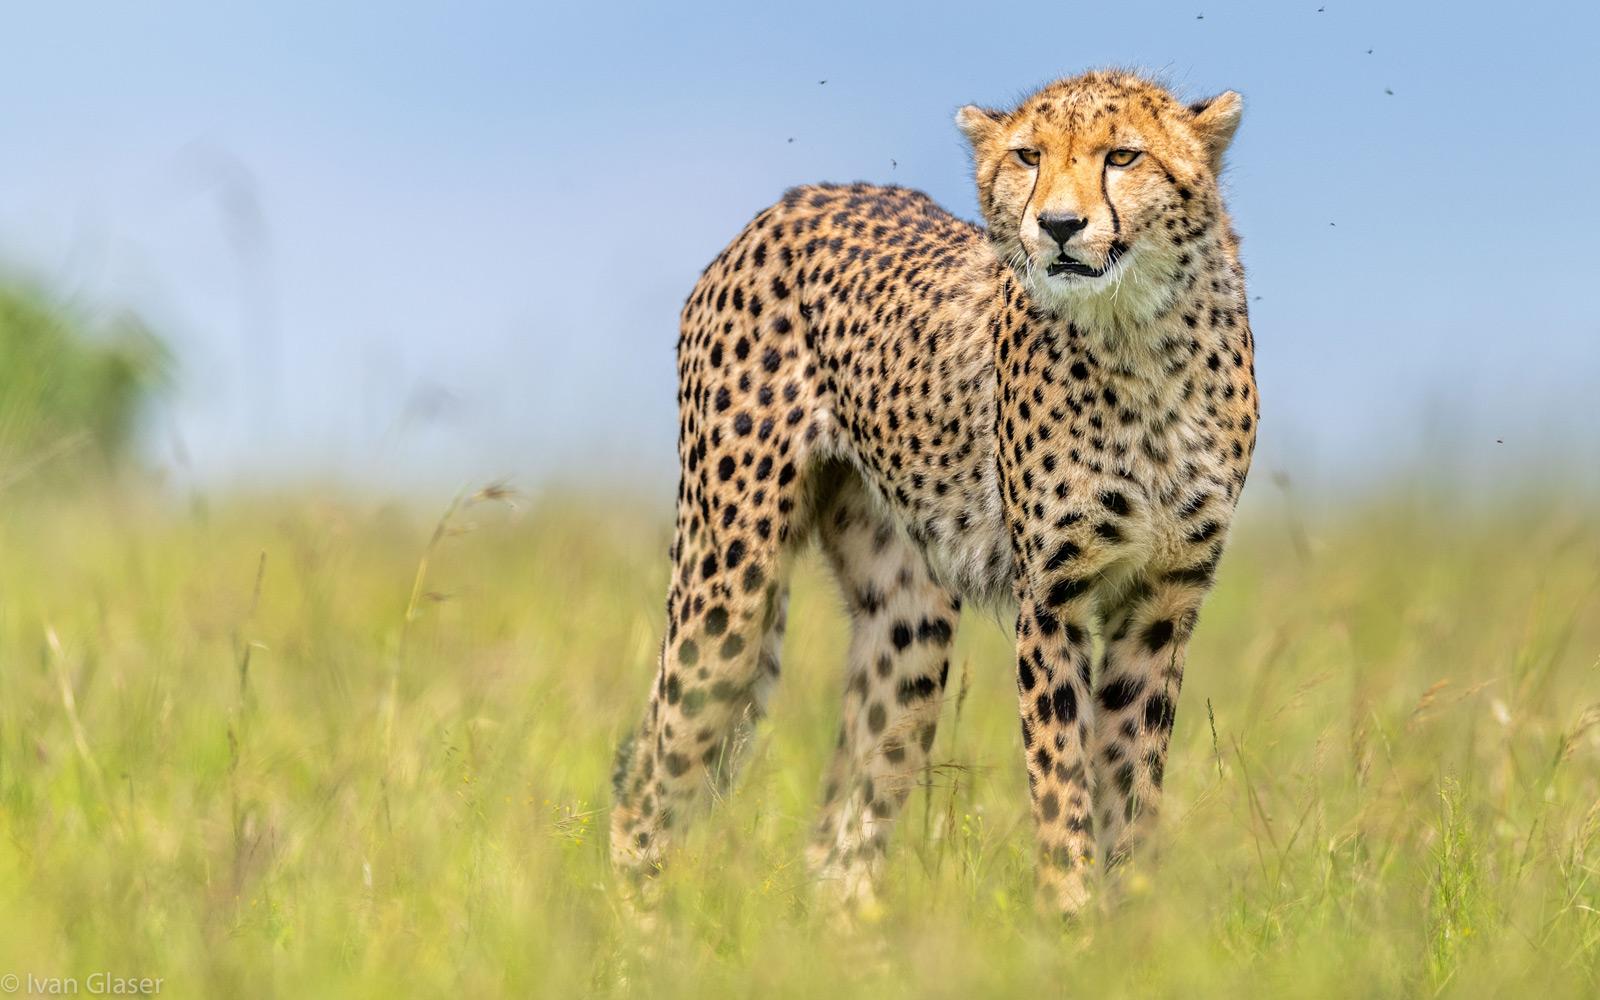 Portrait of a young cheetah. Maasai Mara National Reserve, Kenya © Ivan Glaser